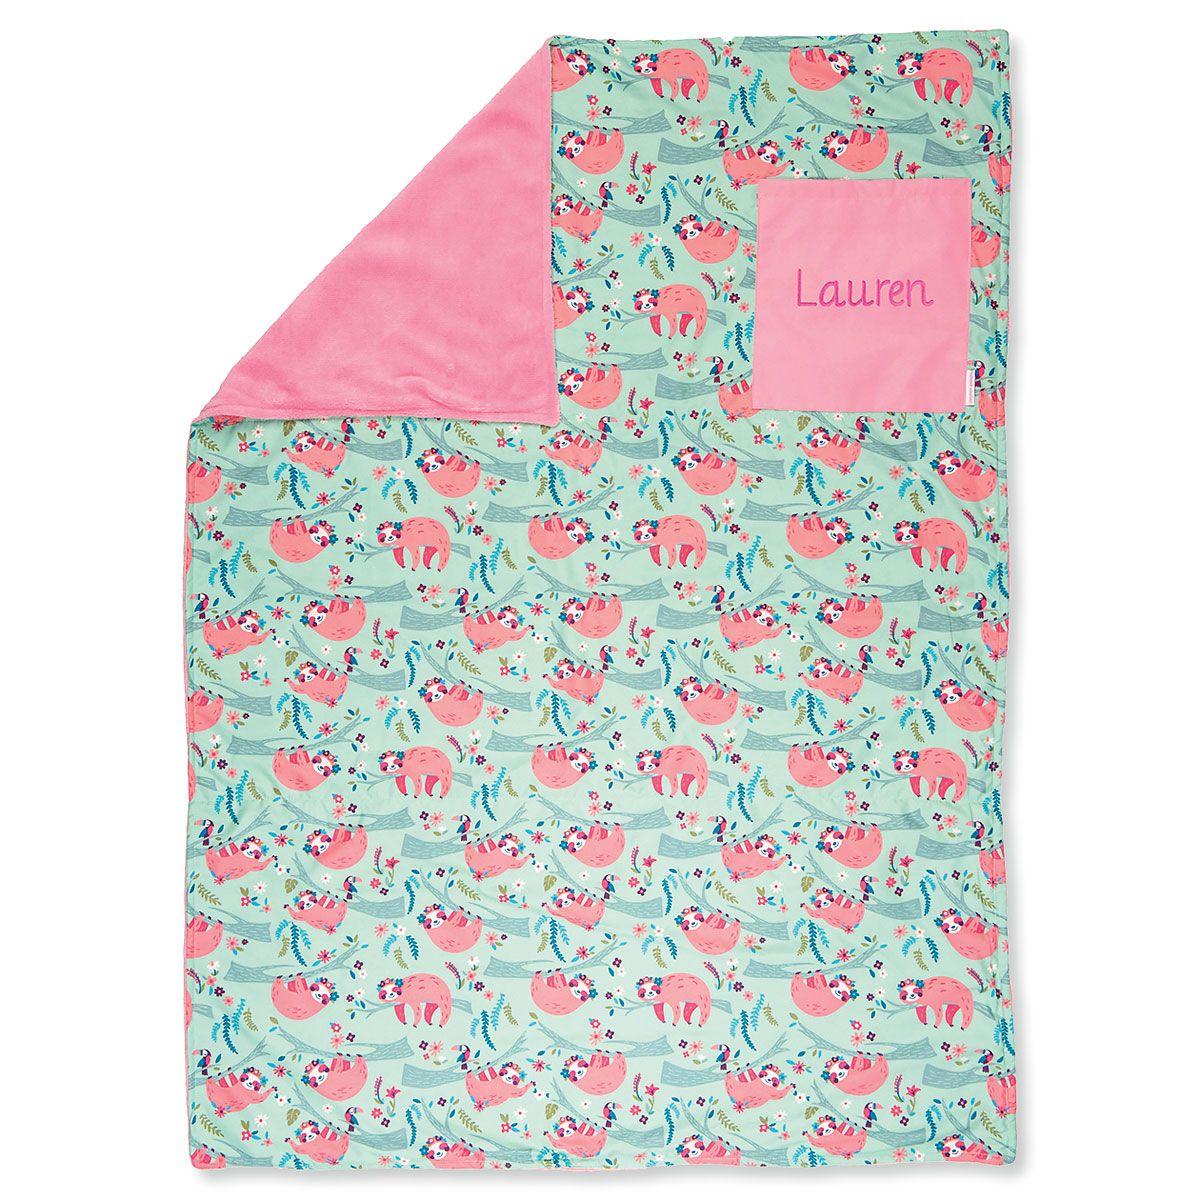 All-Over Sloth Print Blanket by Stephen Joseph®